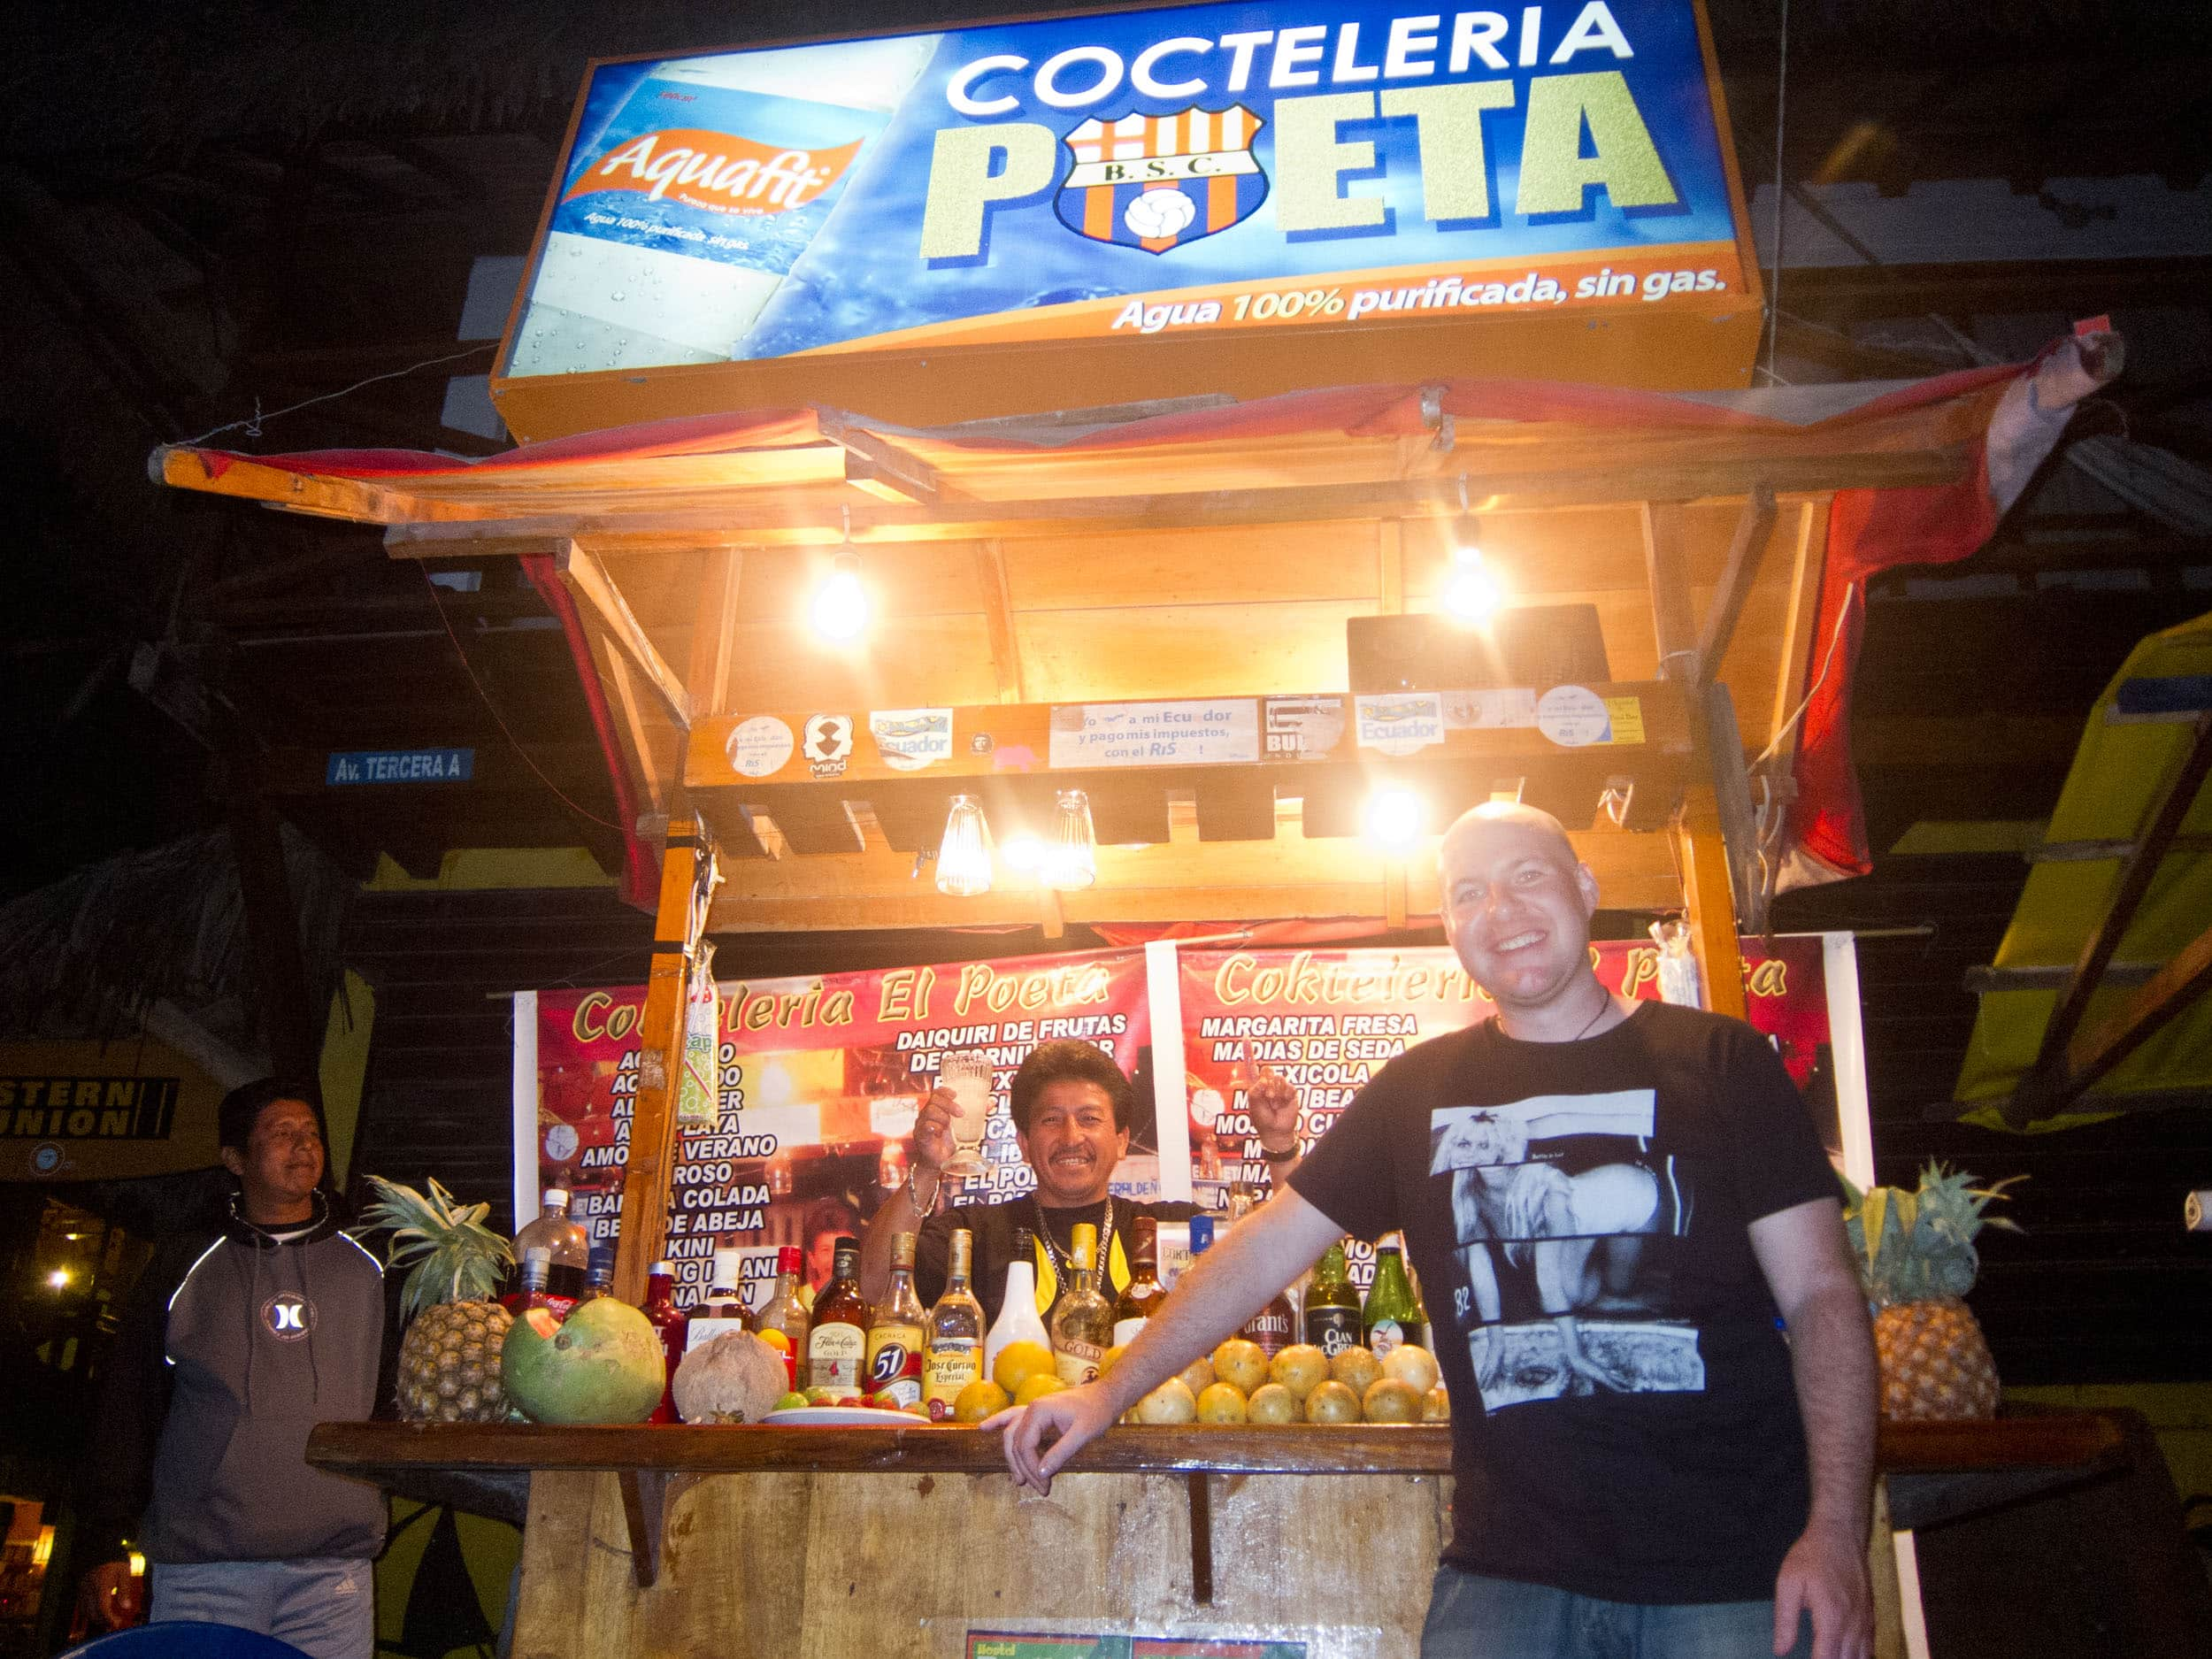 Cocktail vendor